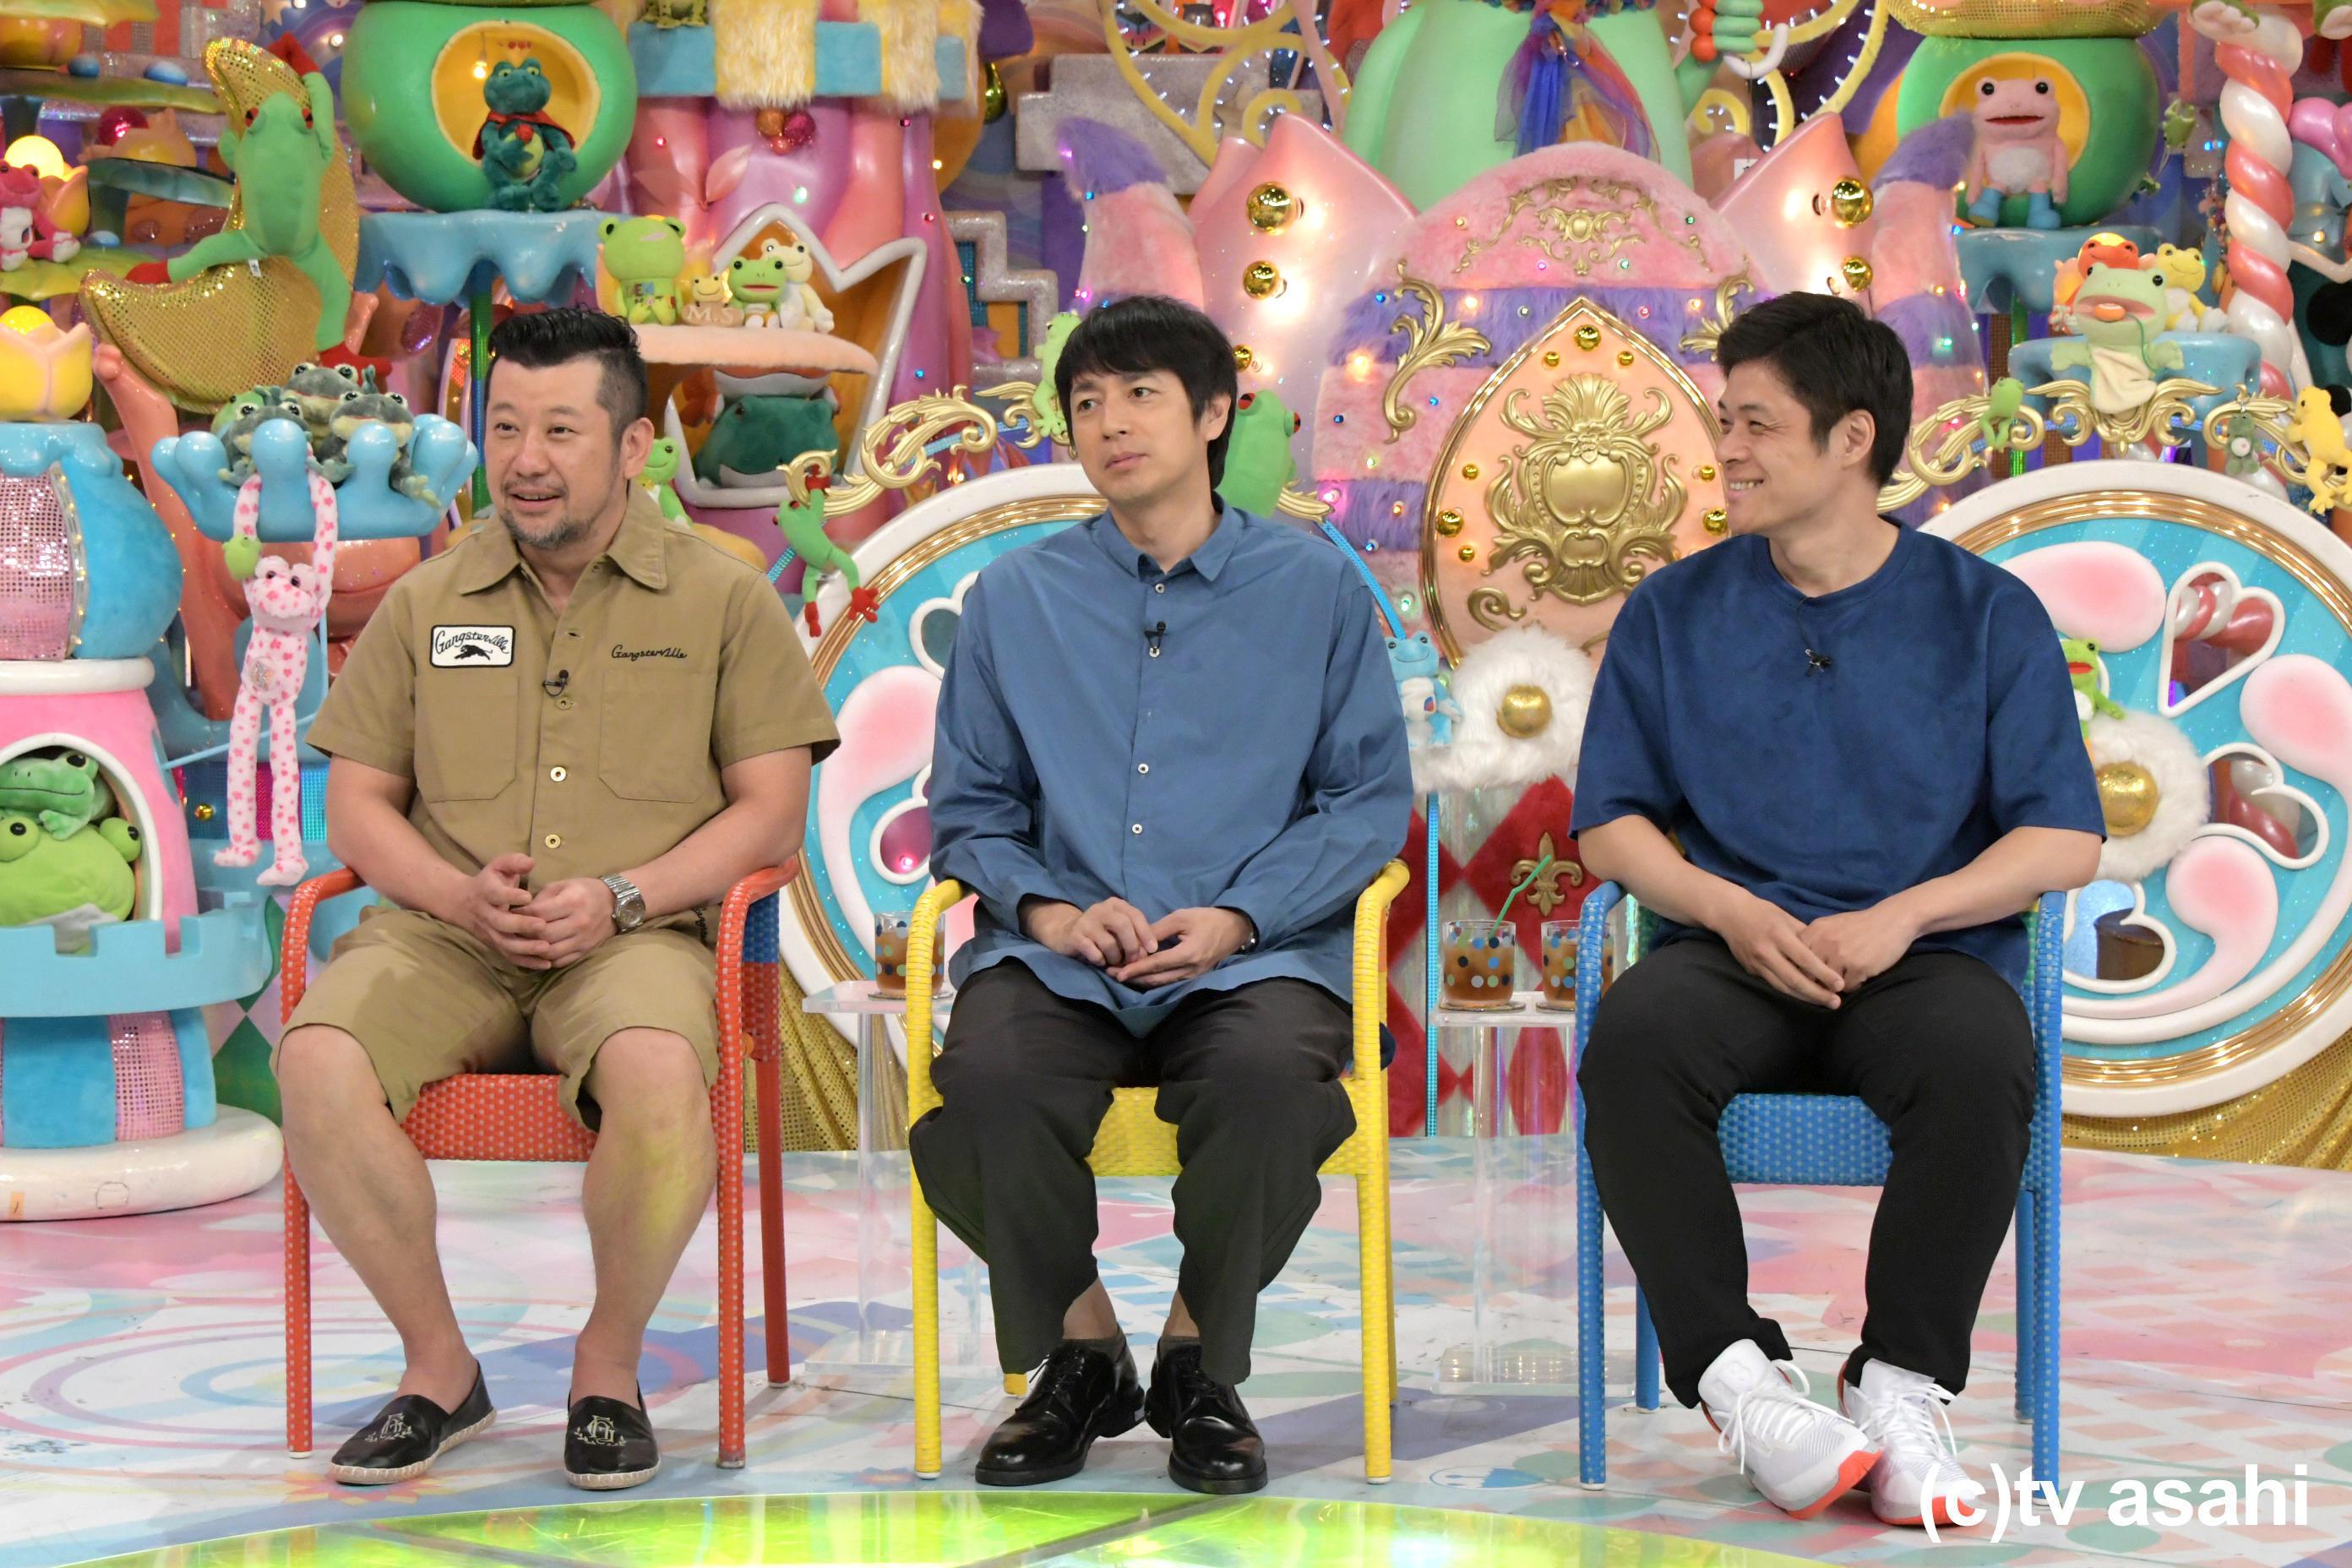 http://news.yoshimoto.co.jp/20180525102052-50ae9542f2a6c2d8d4957459d63de434bd6e1f7c.jpg